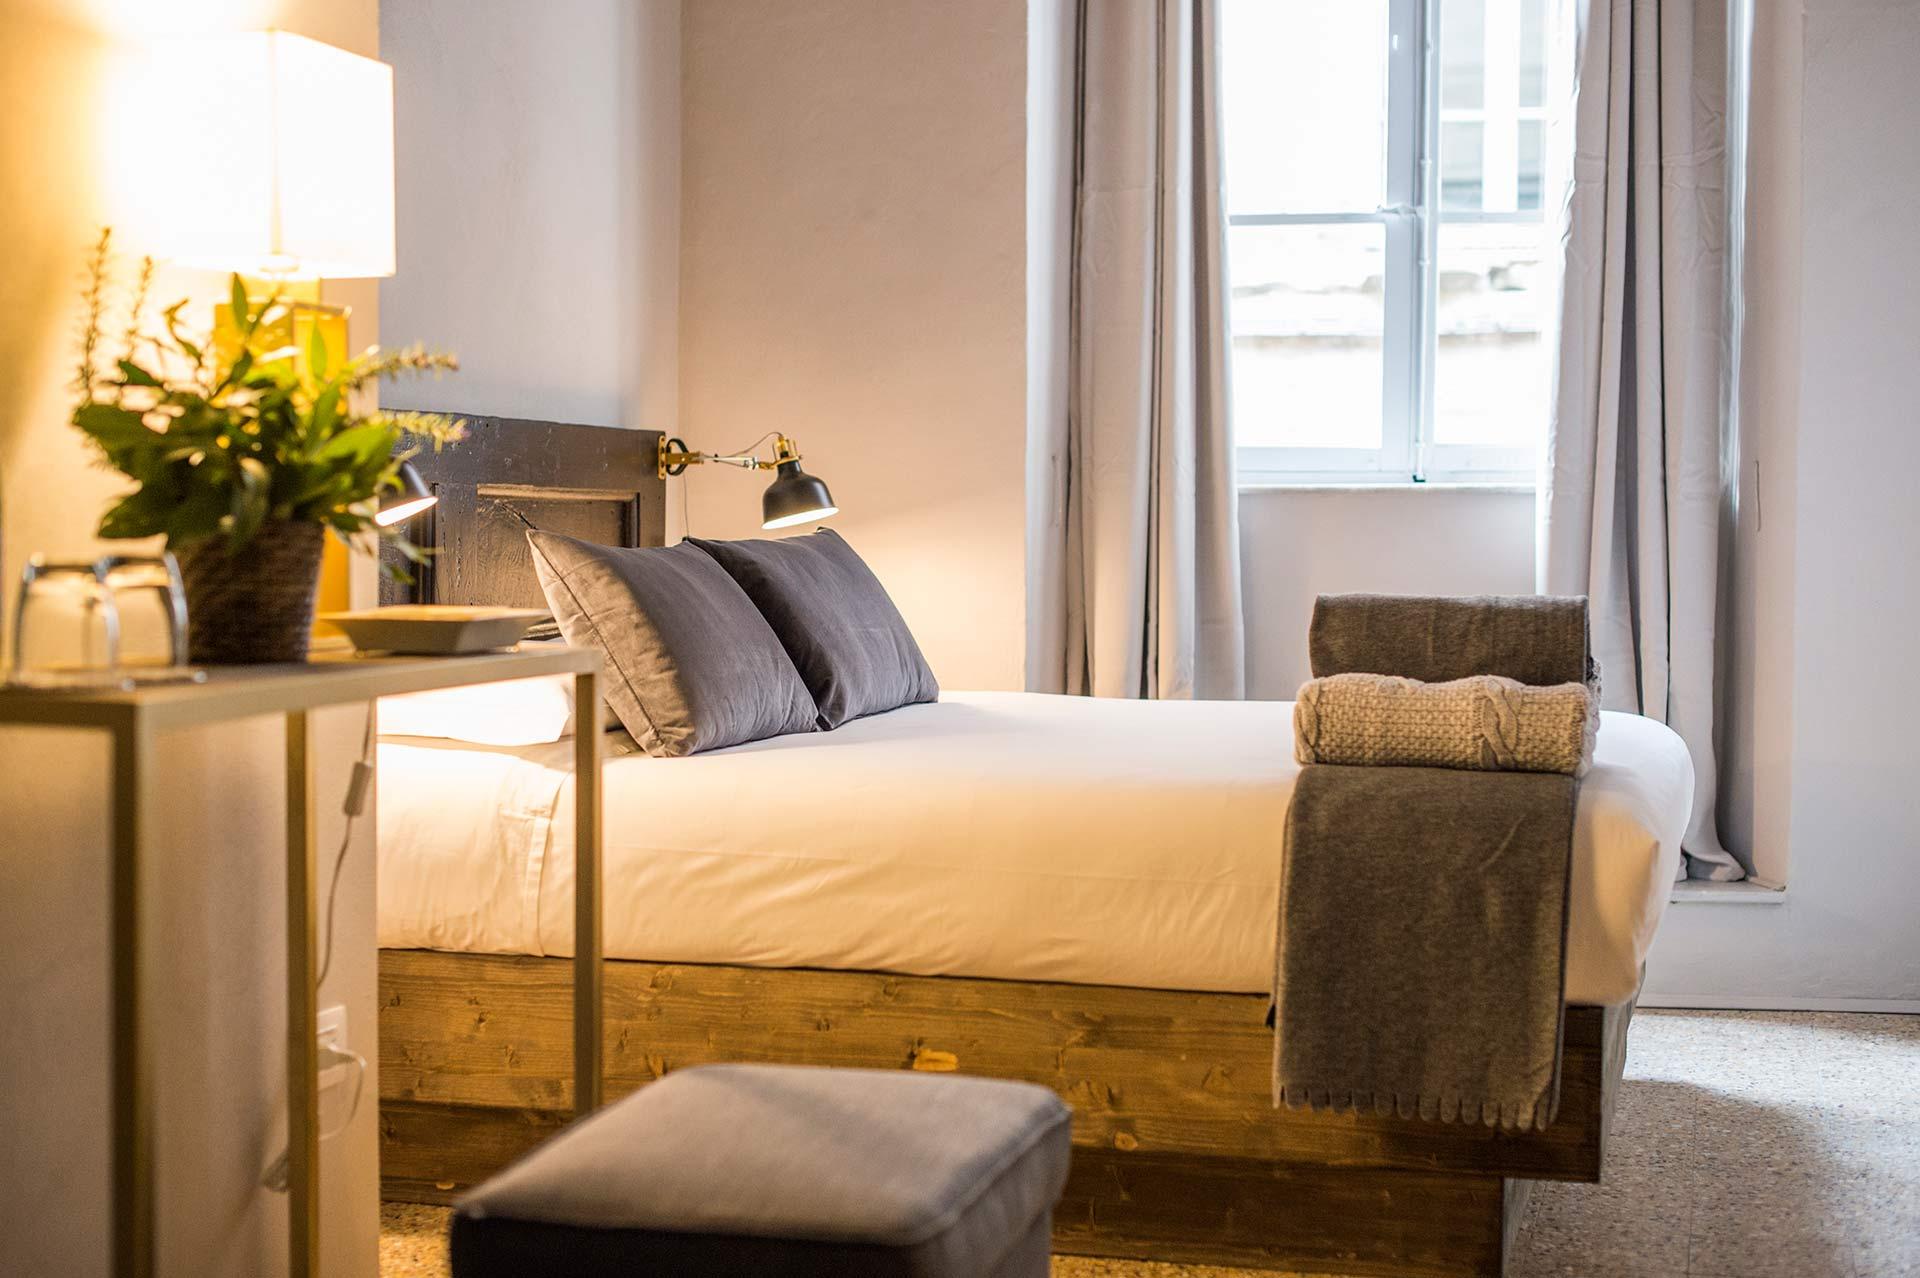 bB_palazzo_del_papa_siena_fullsize_rooms1